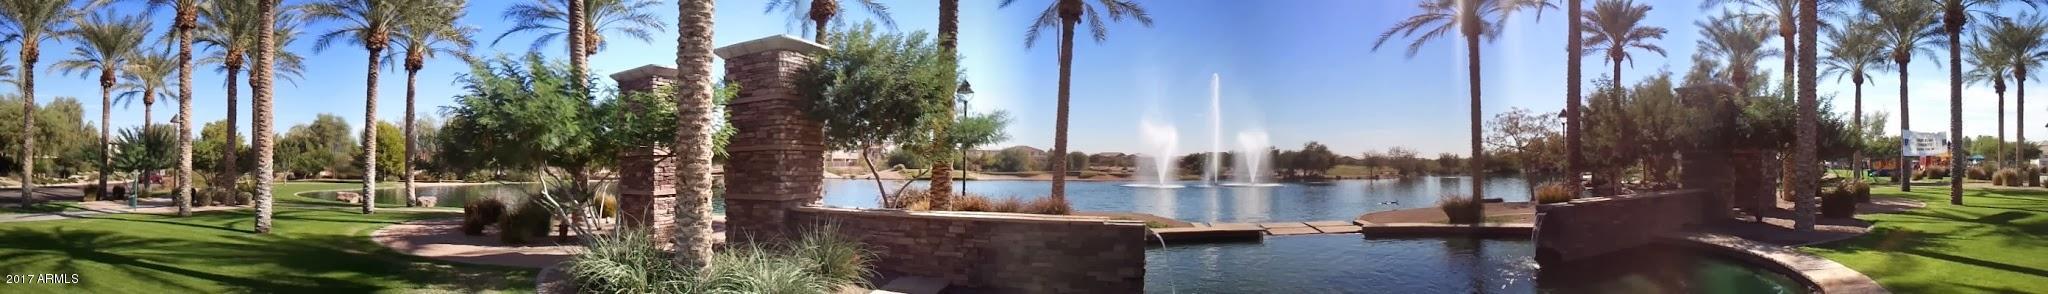 MLS 5608003 42610 W SUNLAND Drive, Maricopa, AZ Maricopa AZ Golf